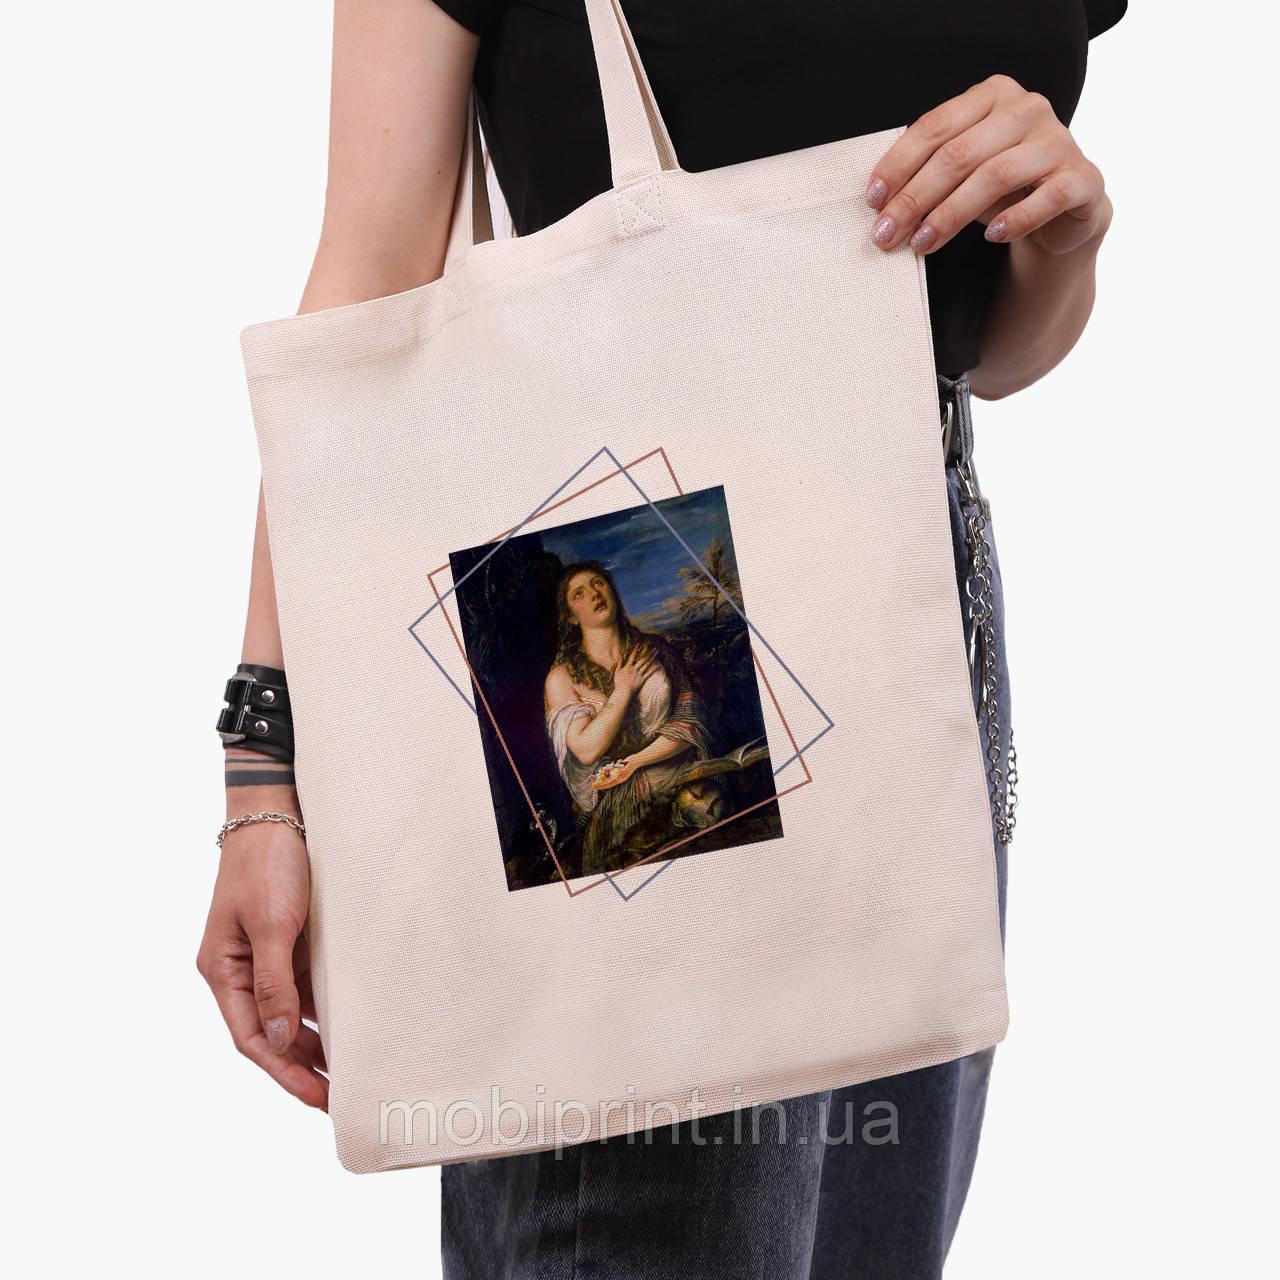 Эко сумка шоппер Мария Магдалина (Mary Magdalene) (9227-1413)  экосумка шопер 41*35 см